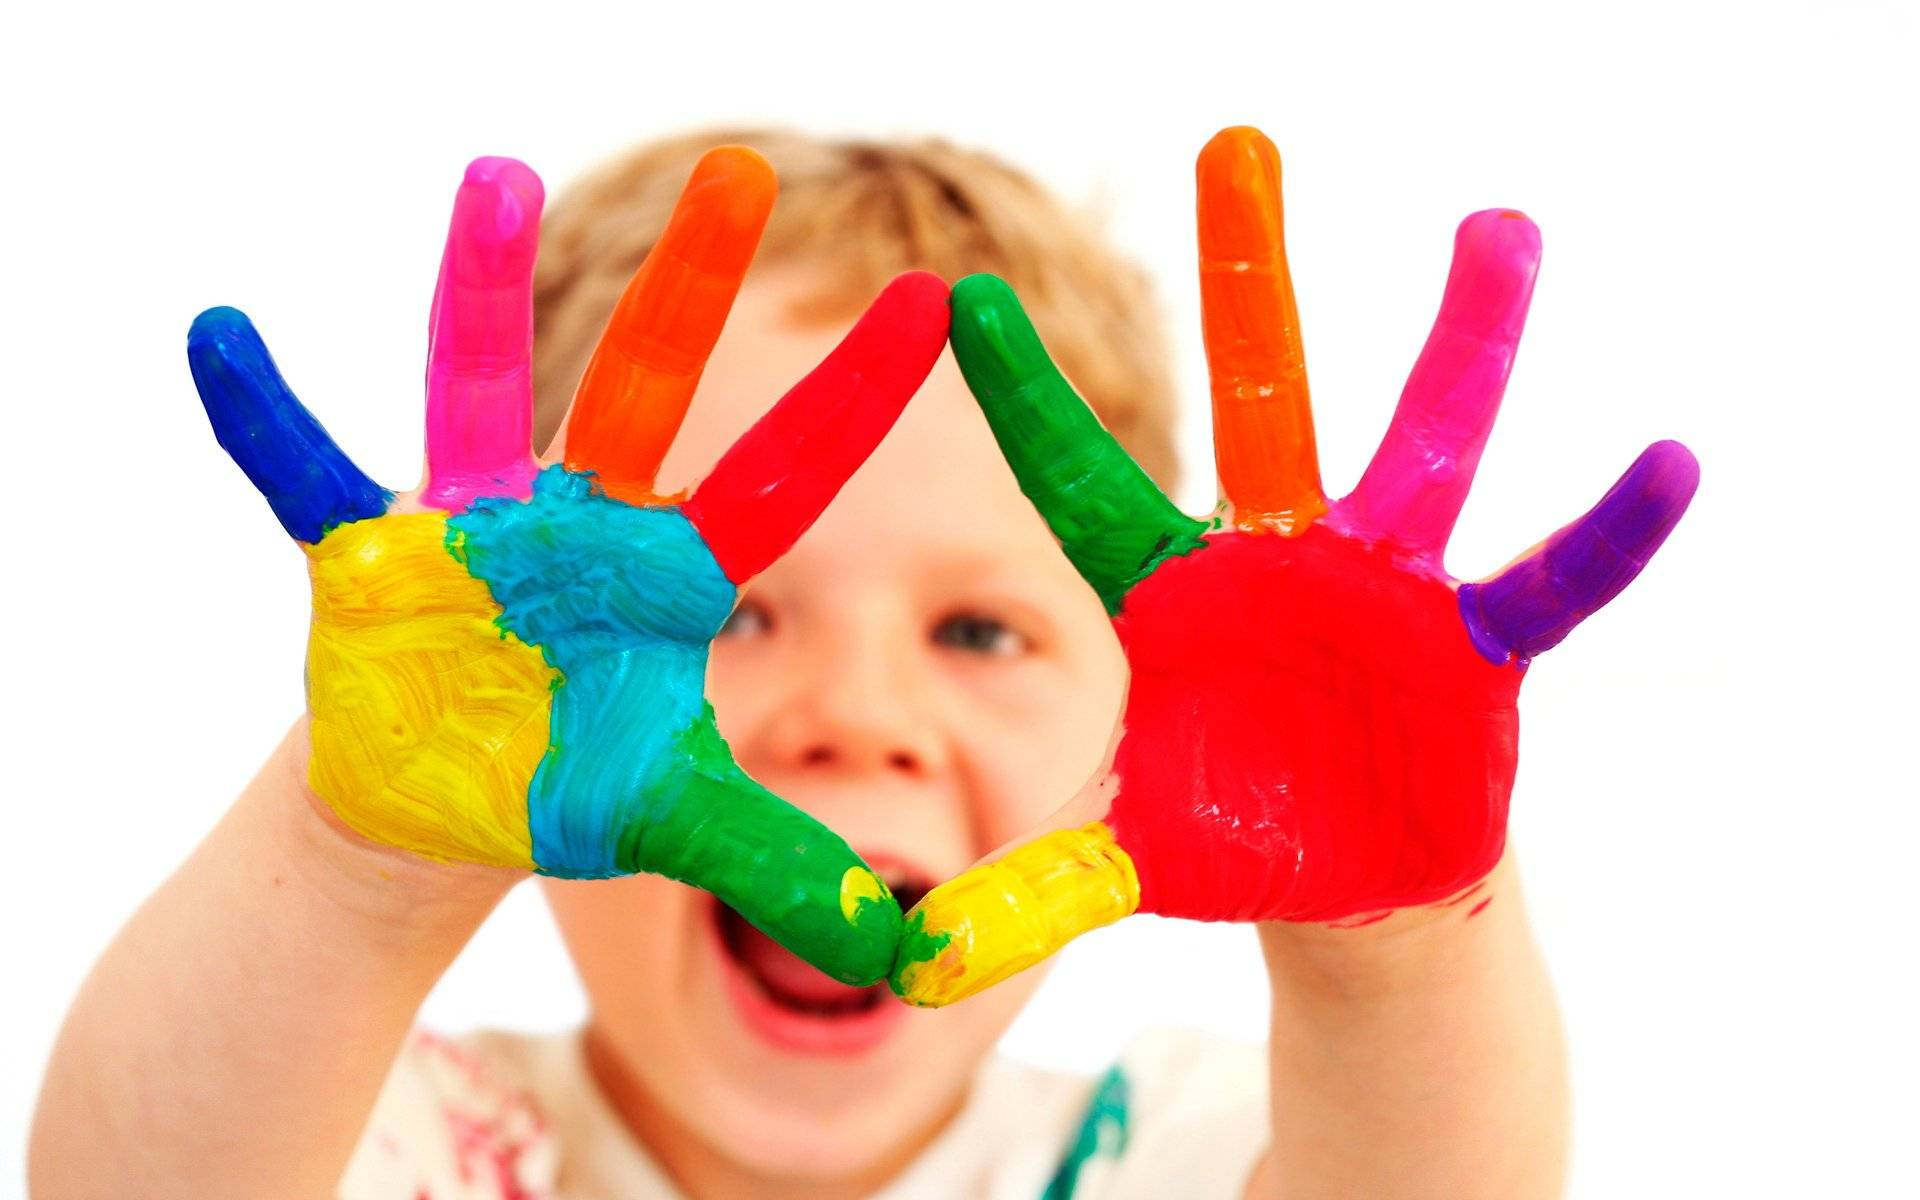 Colors-Childrens-Day-Wallpaper-14-November